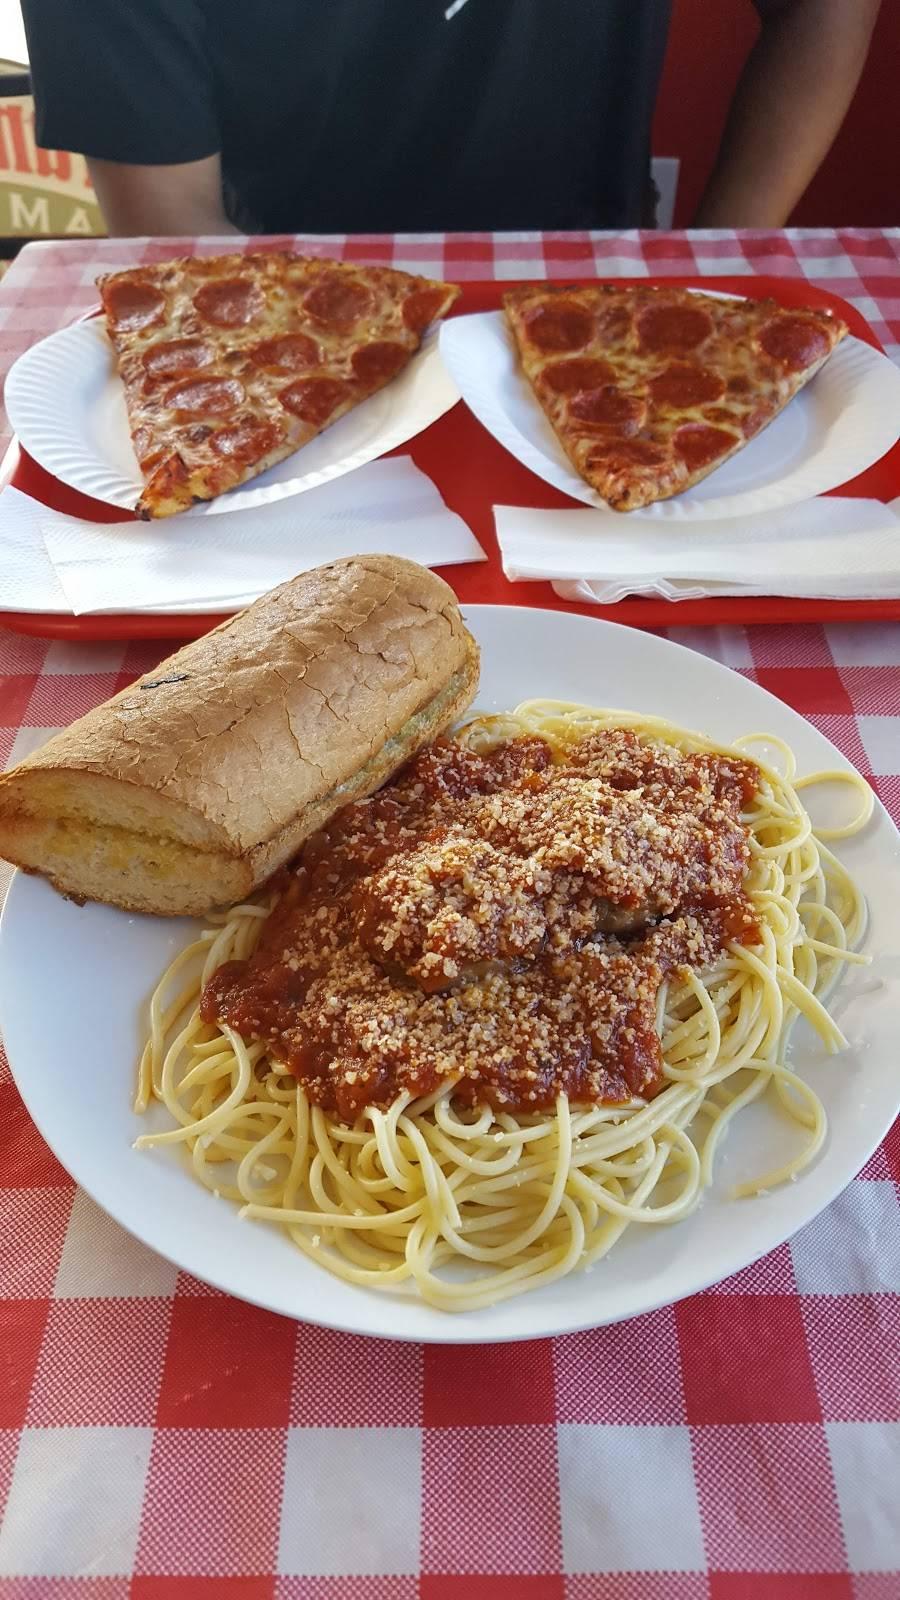 Frankies Famous Pizza - restaurant  | Photo 7 of 10 | Address: 1561 N Cooper Rd #101, Gilbert, AZ 85233, USA | Phone: (480) 507-7777